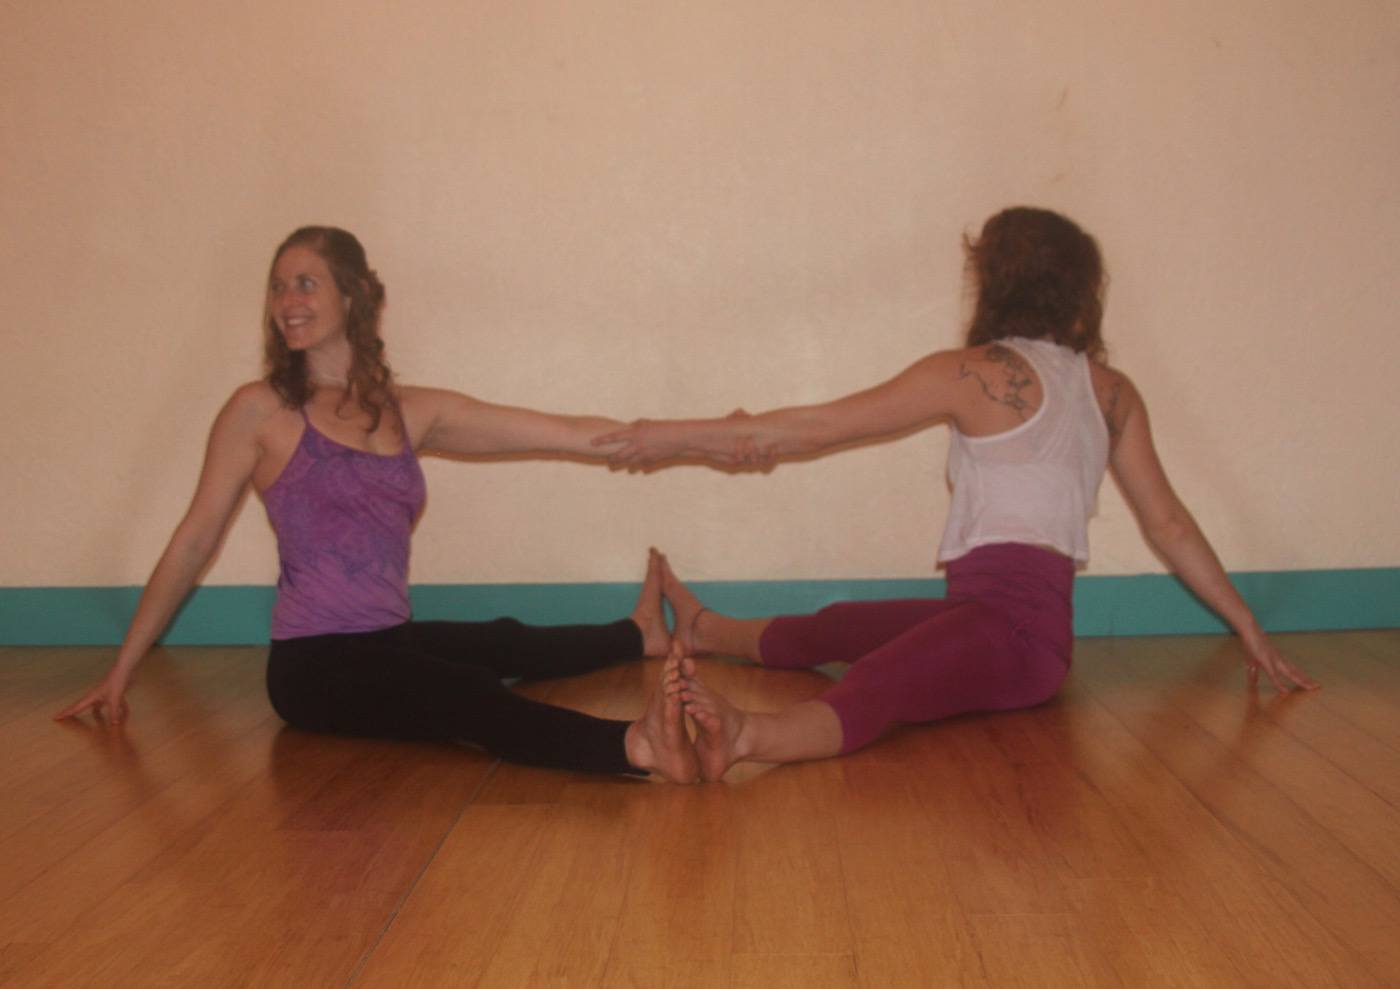 Wanderlust Partner Yoga Poses to Strengthen Your Relationship